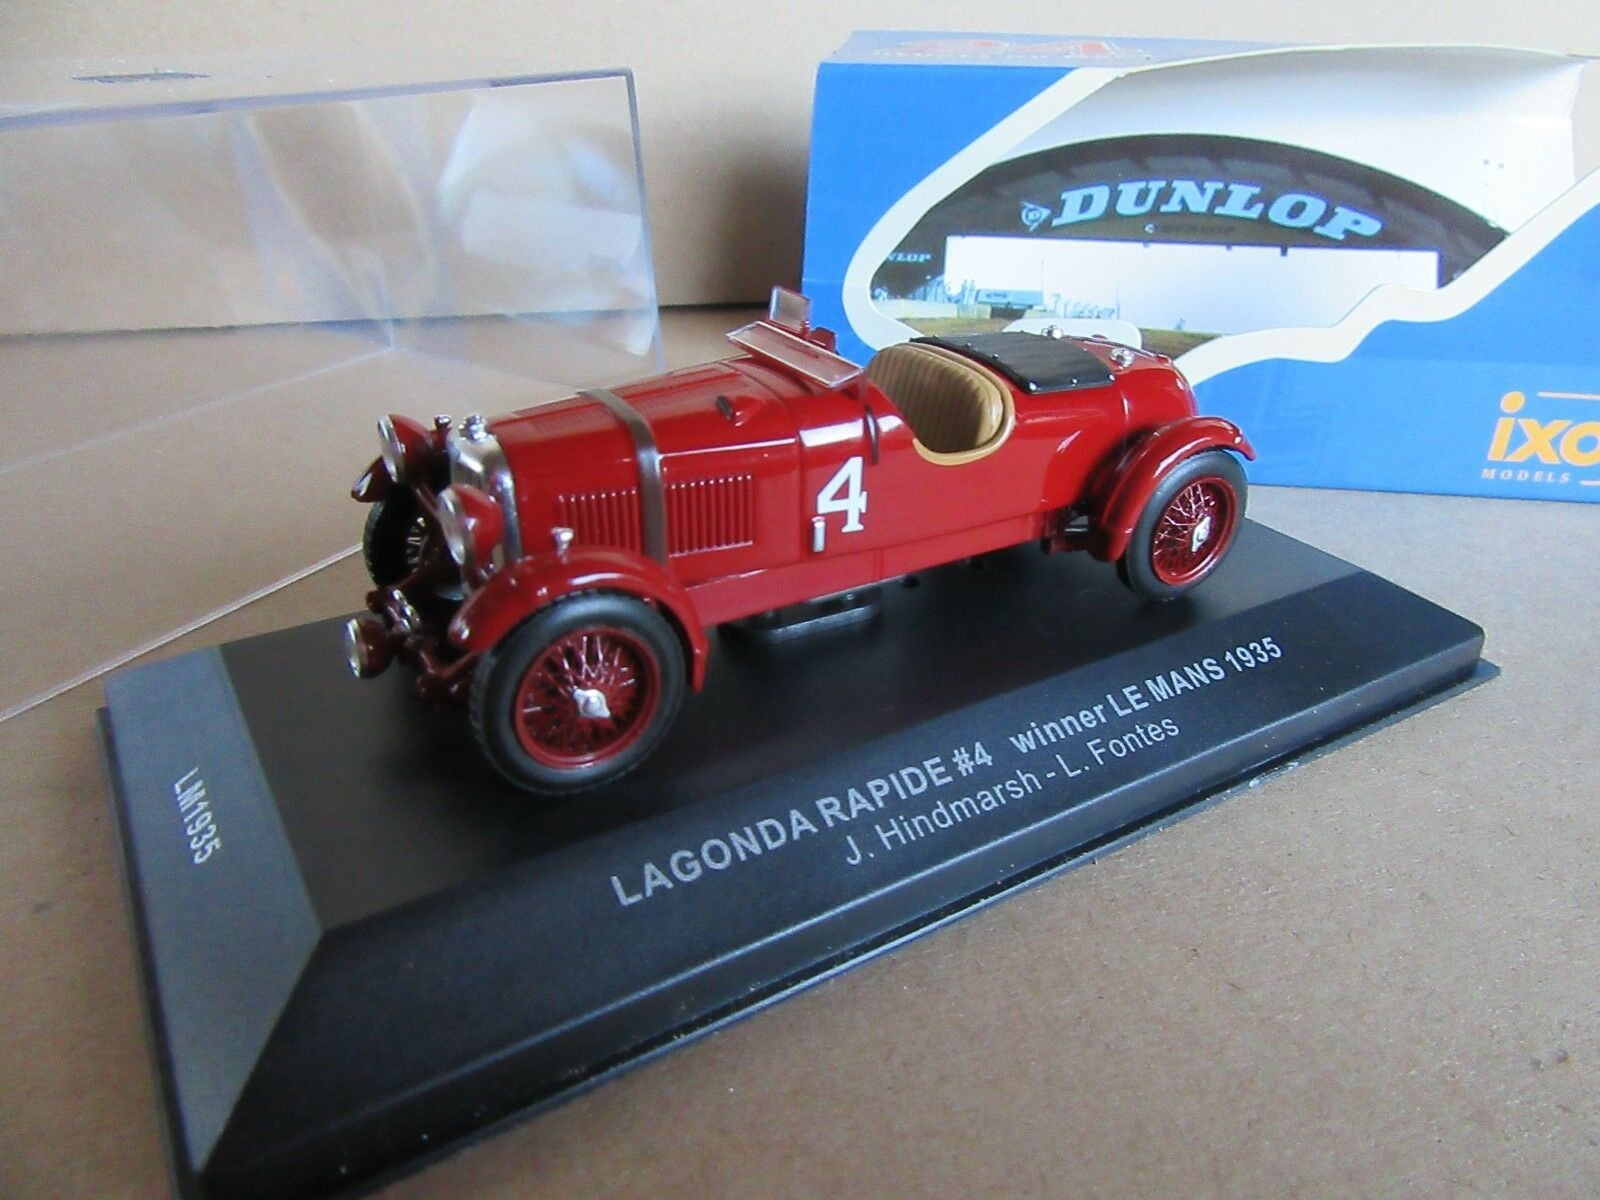 360F Ixo Models LM1935 Lagonda Rapide     4 Winner Le Mans 1935 Fontes 1 43 ae9ff7